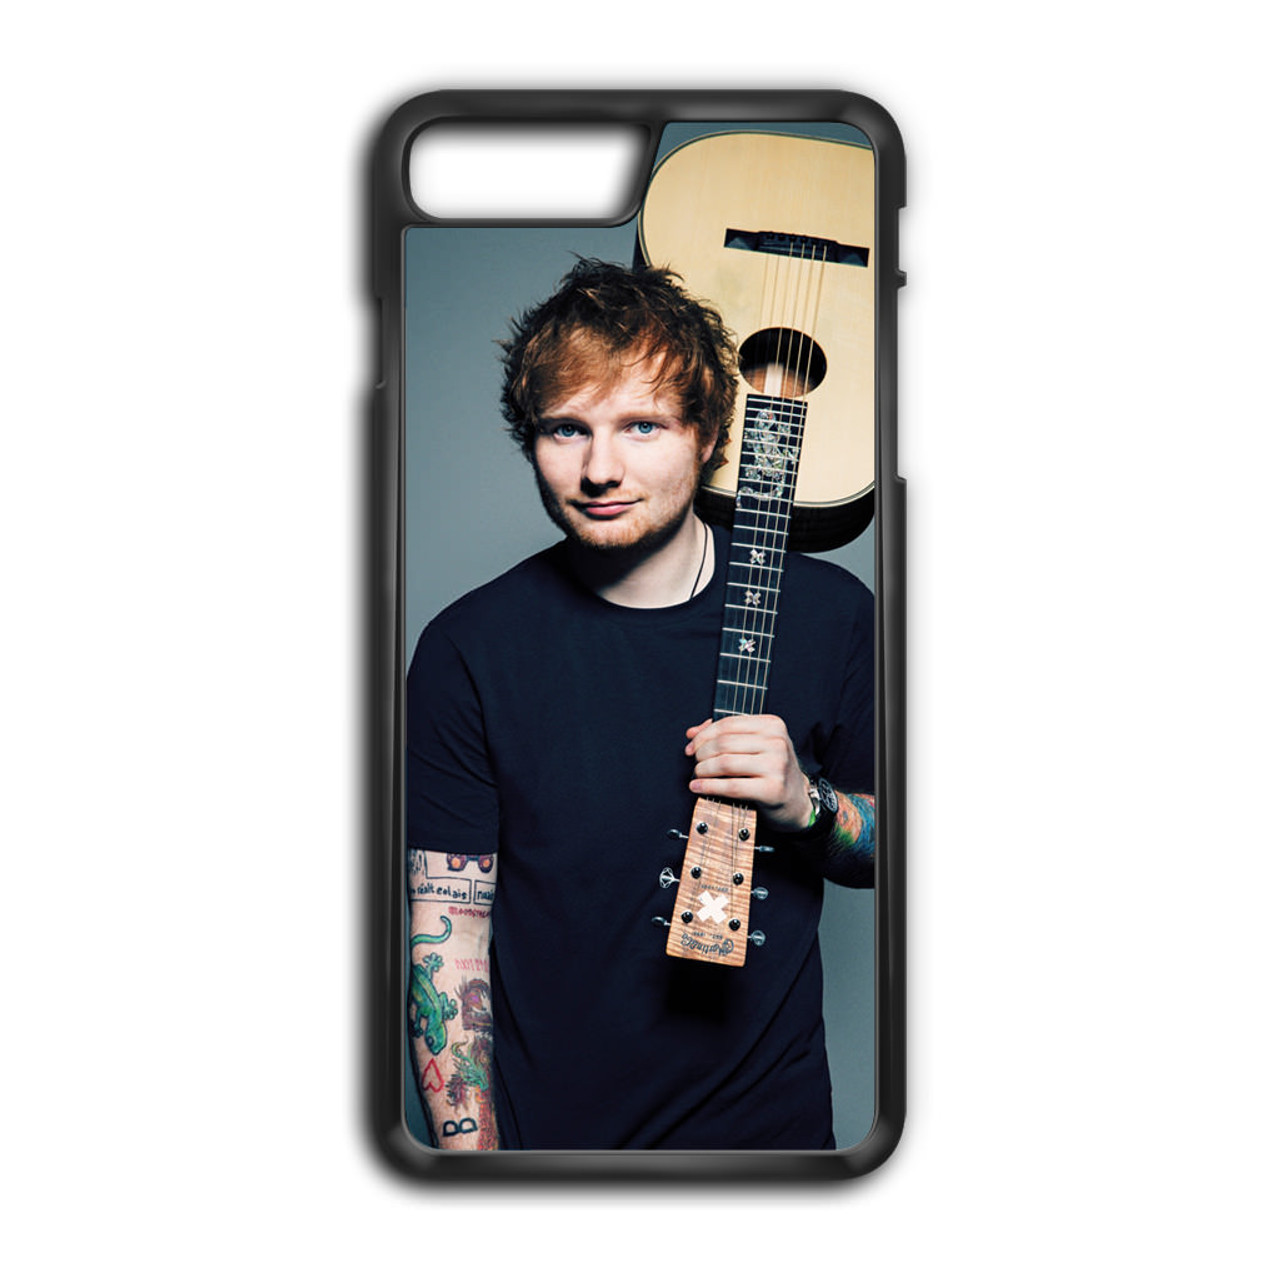 ed sheeran phone case iphone 7